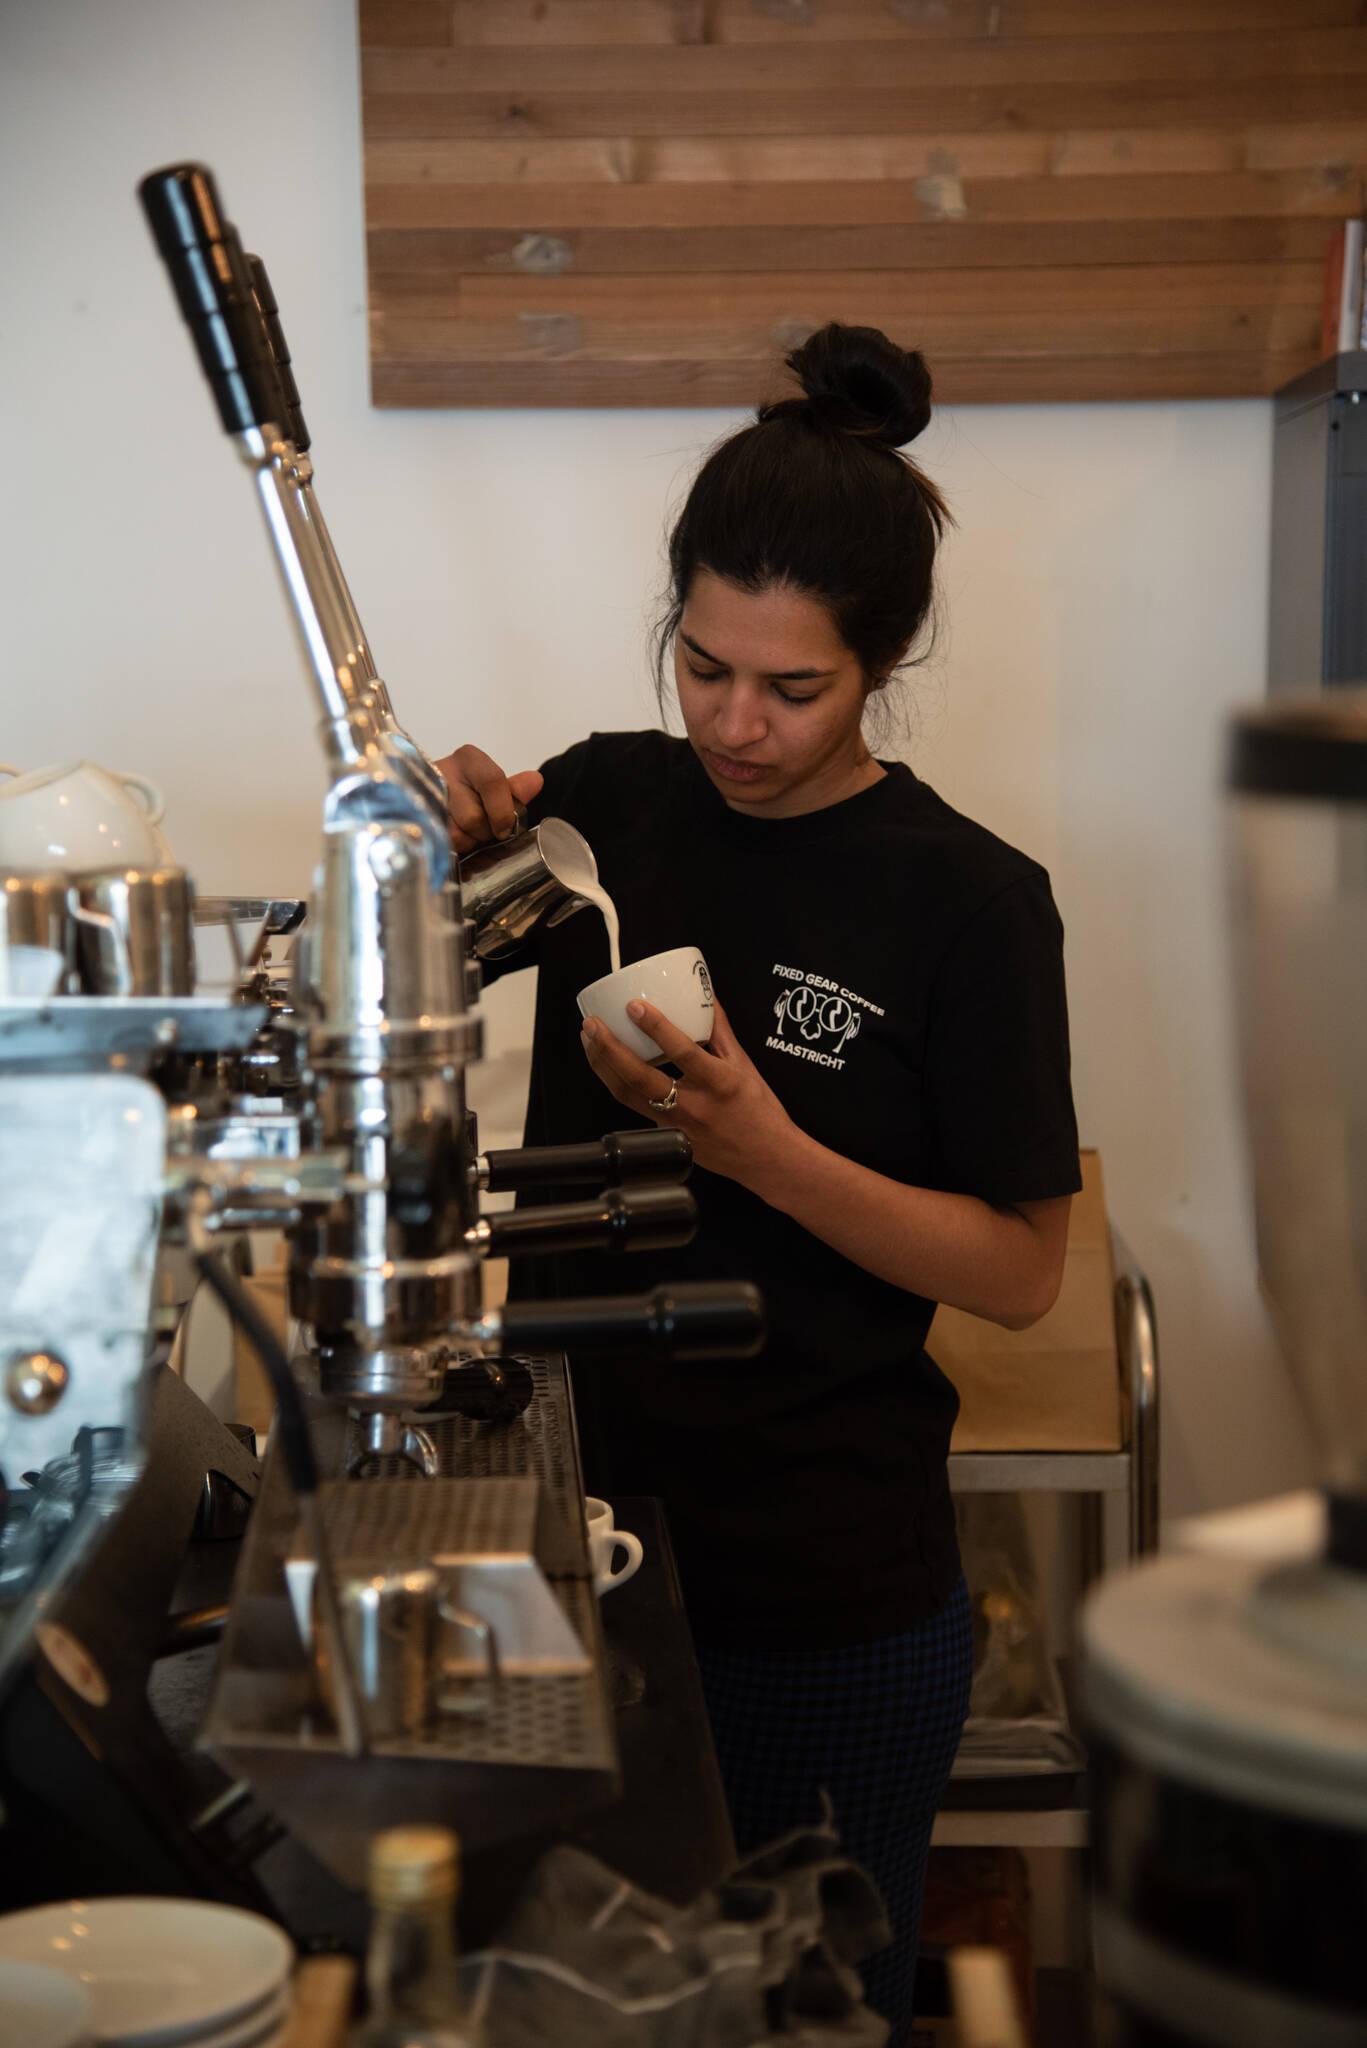 Fixed Gear Coffee – Maastricht in Maastricht